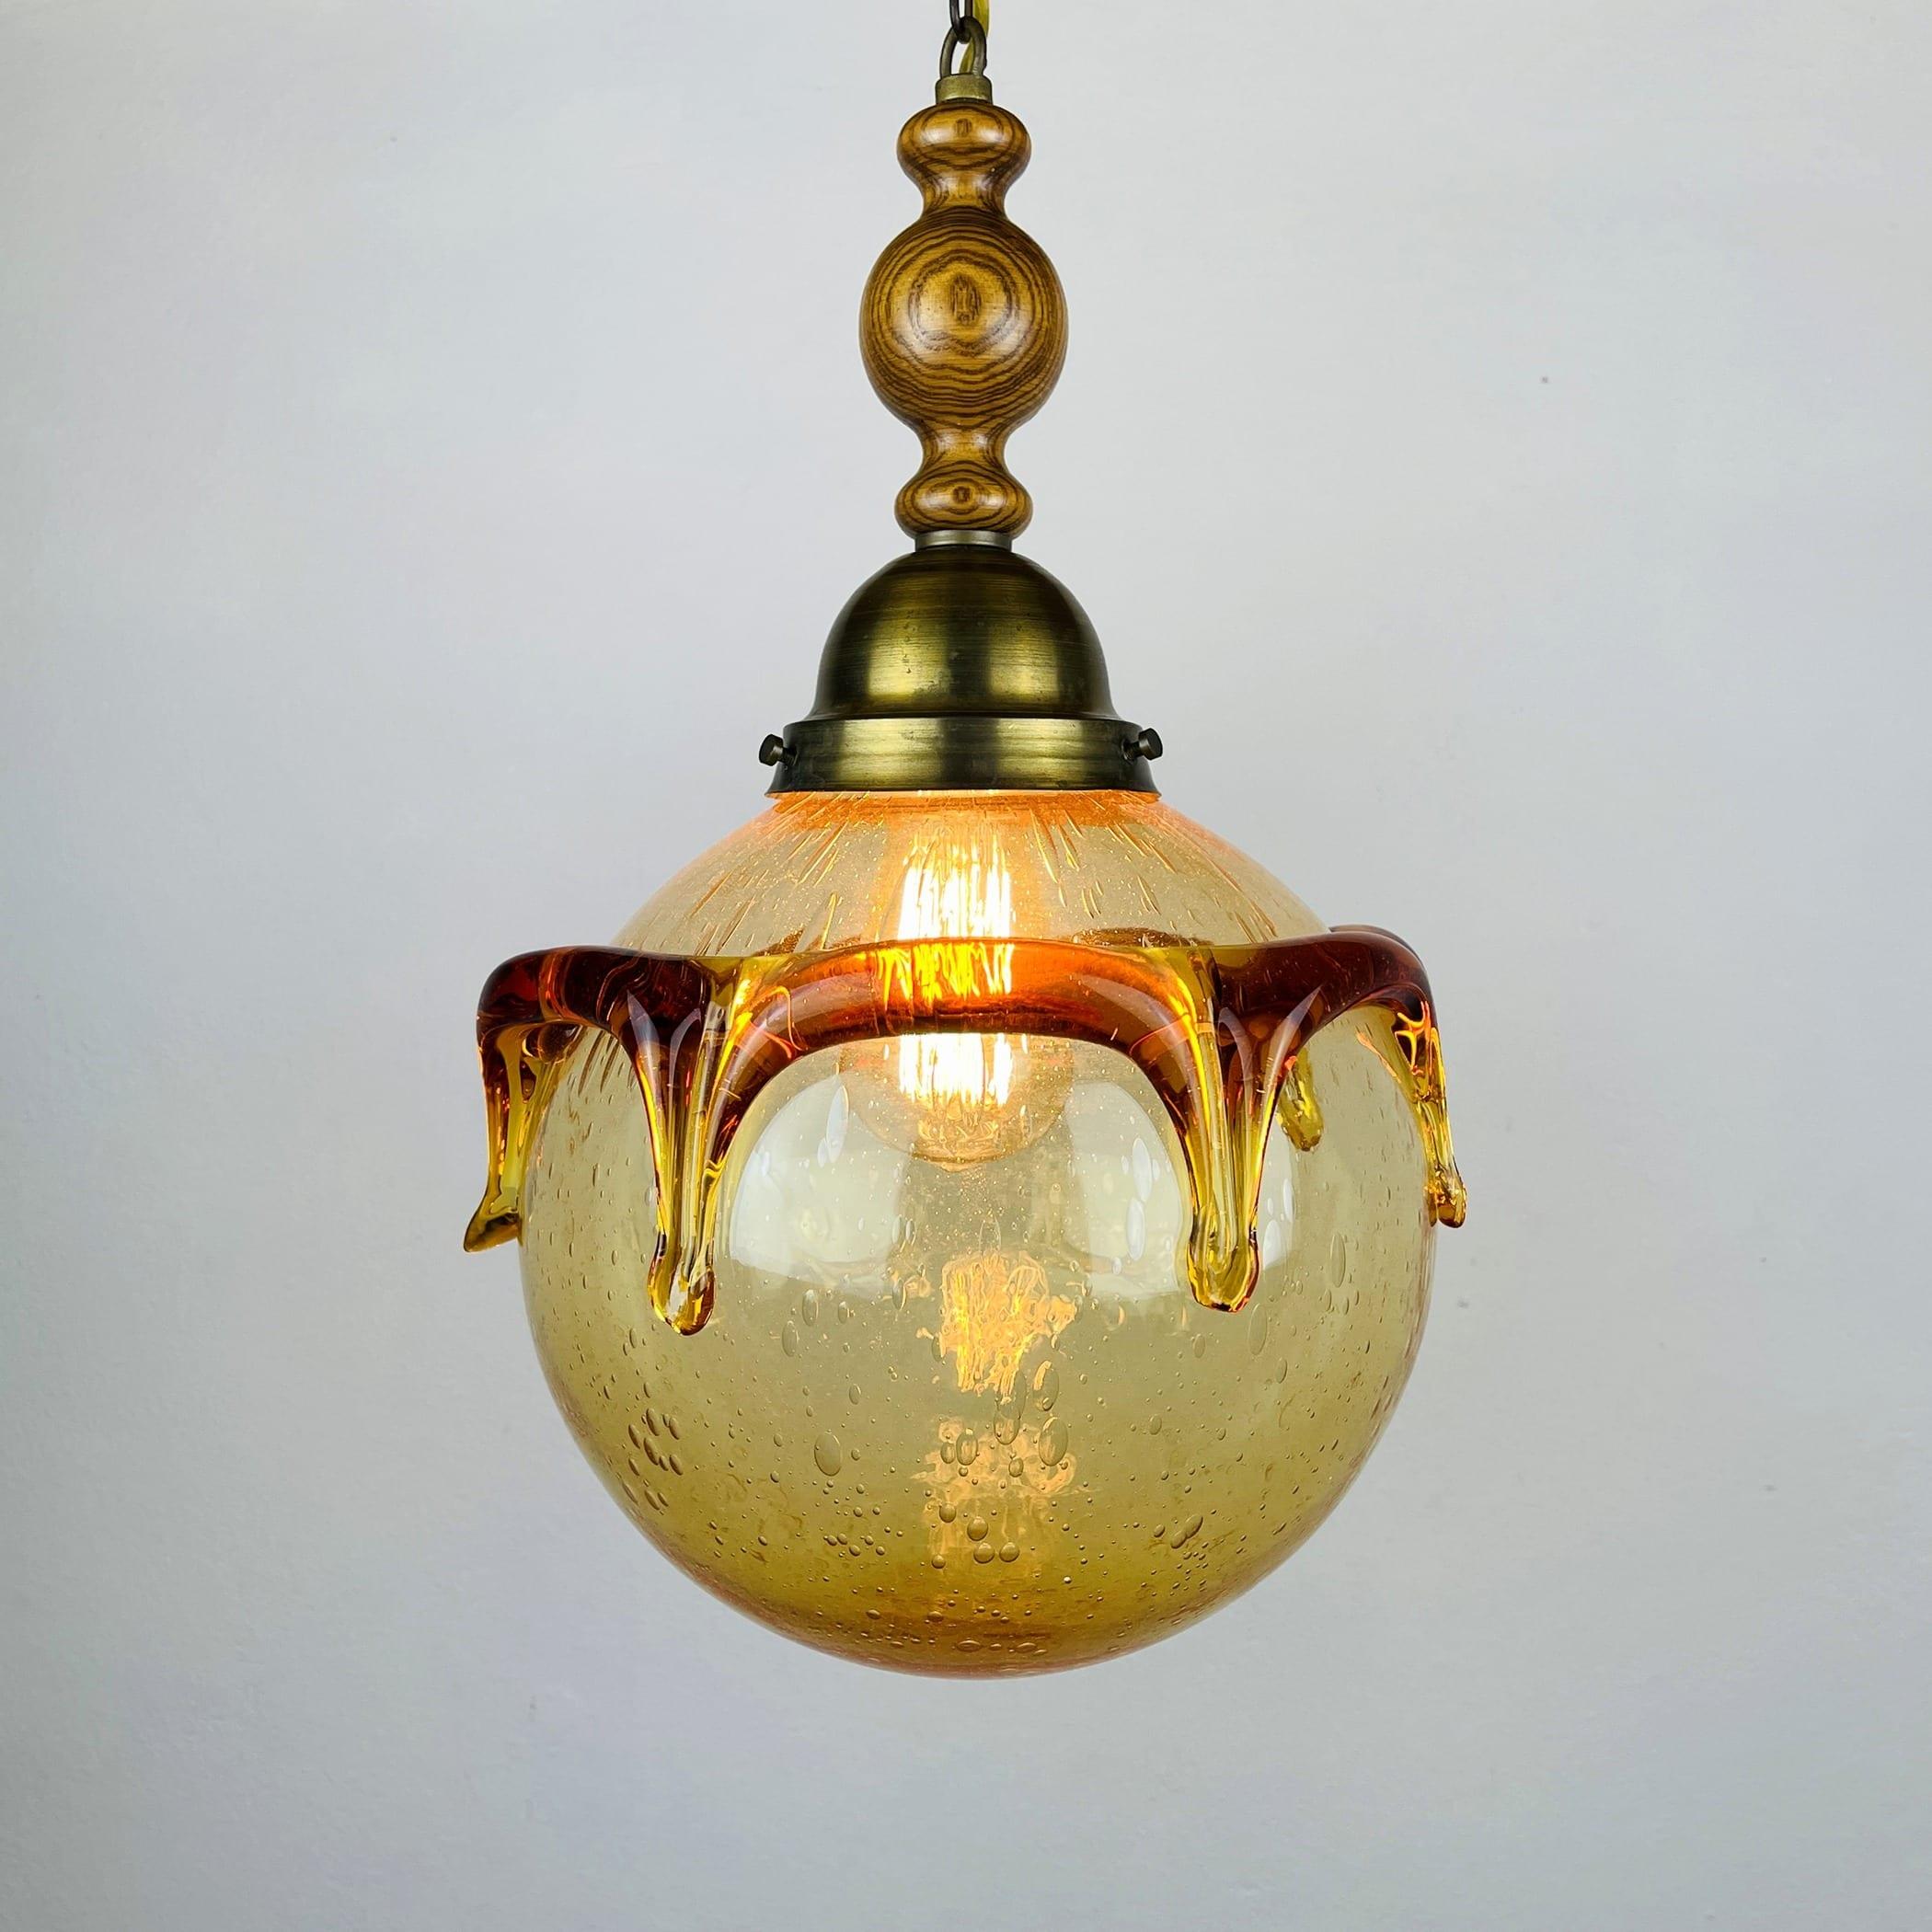 Vintage murano glass pendant lamp Italy 1960s beige and amber Retro home decor Mid-century light